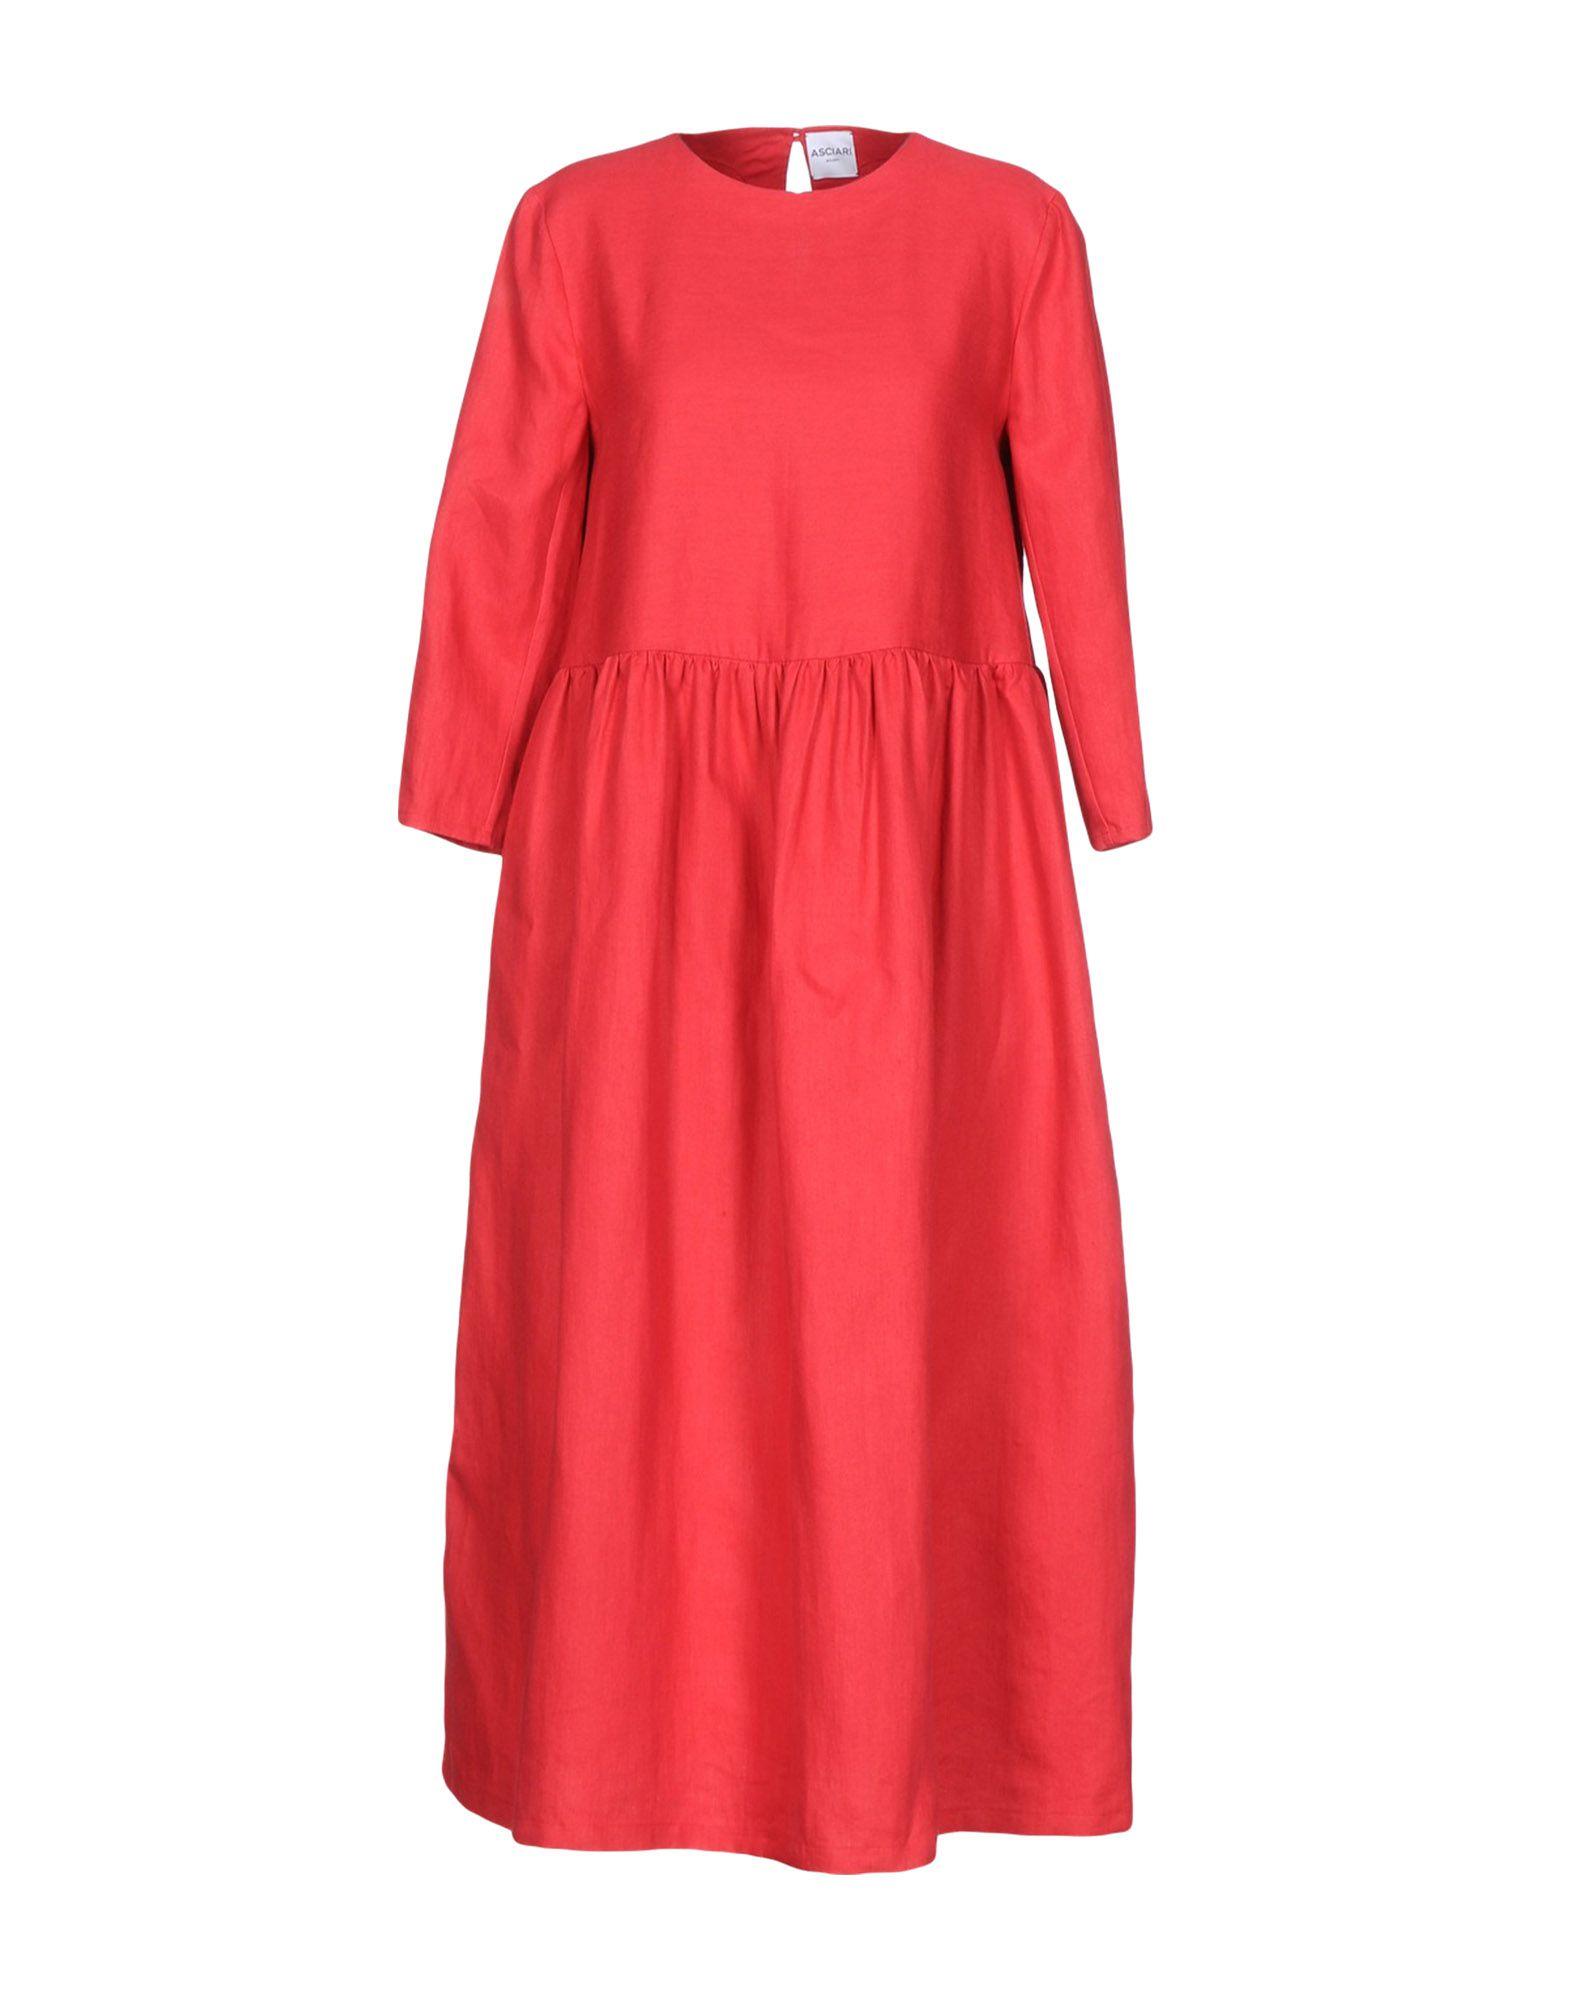 ASCIARI Платье длиной 3/4 lisa corti платье длиной 3 4